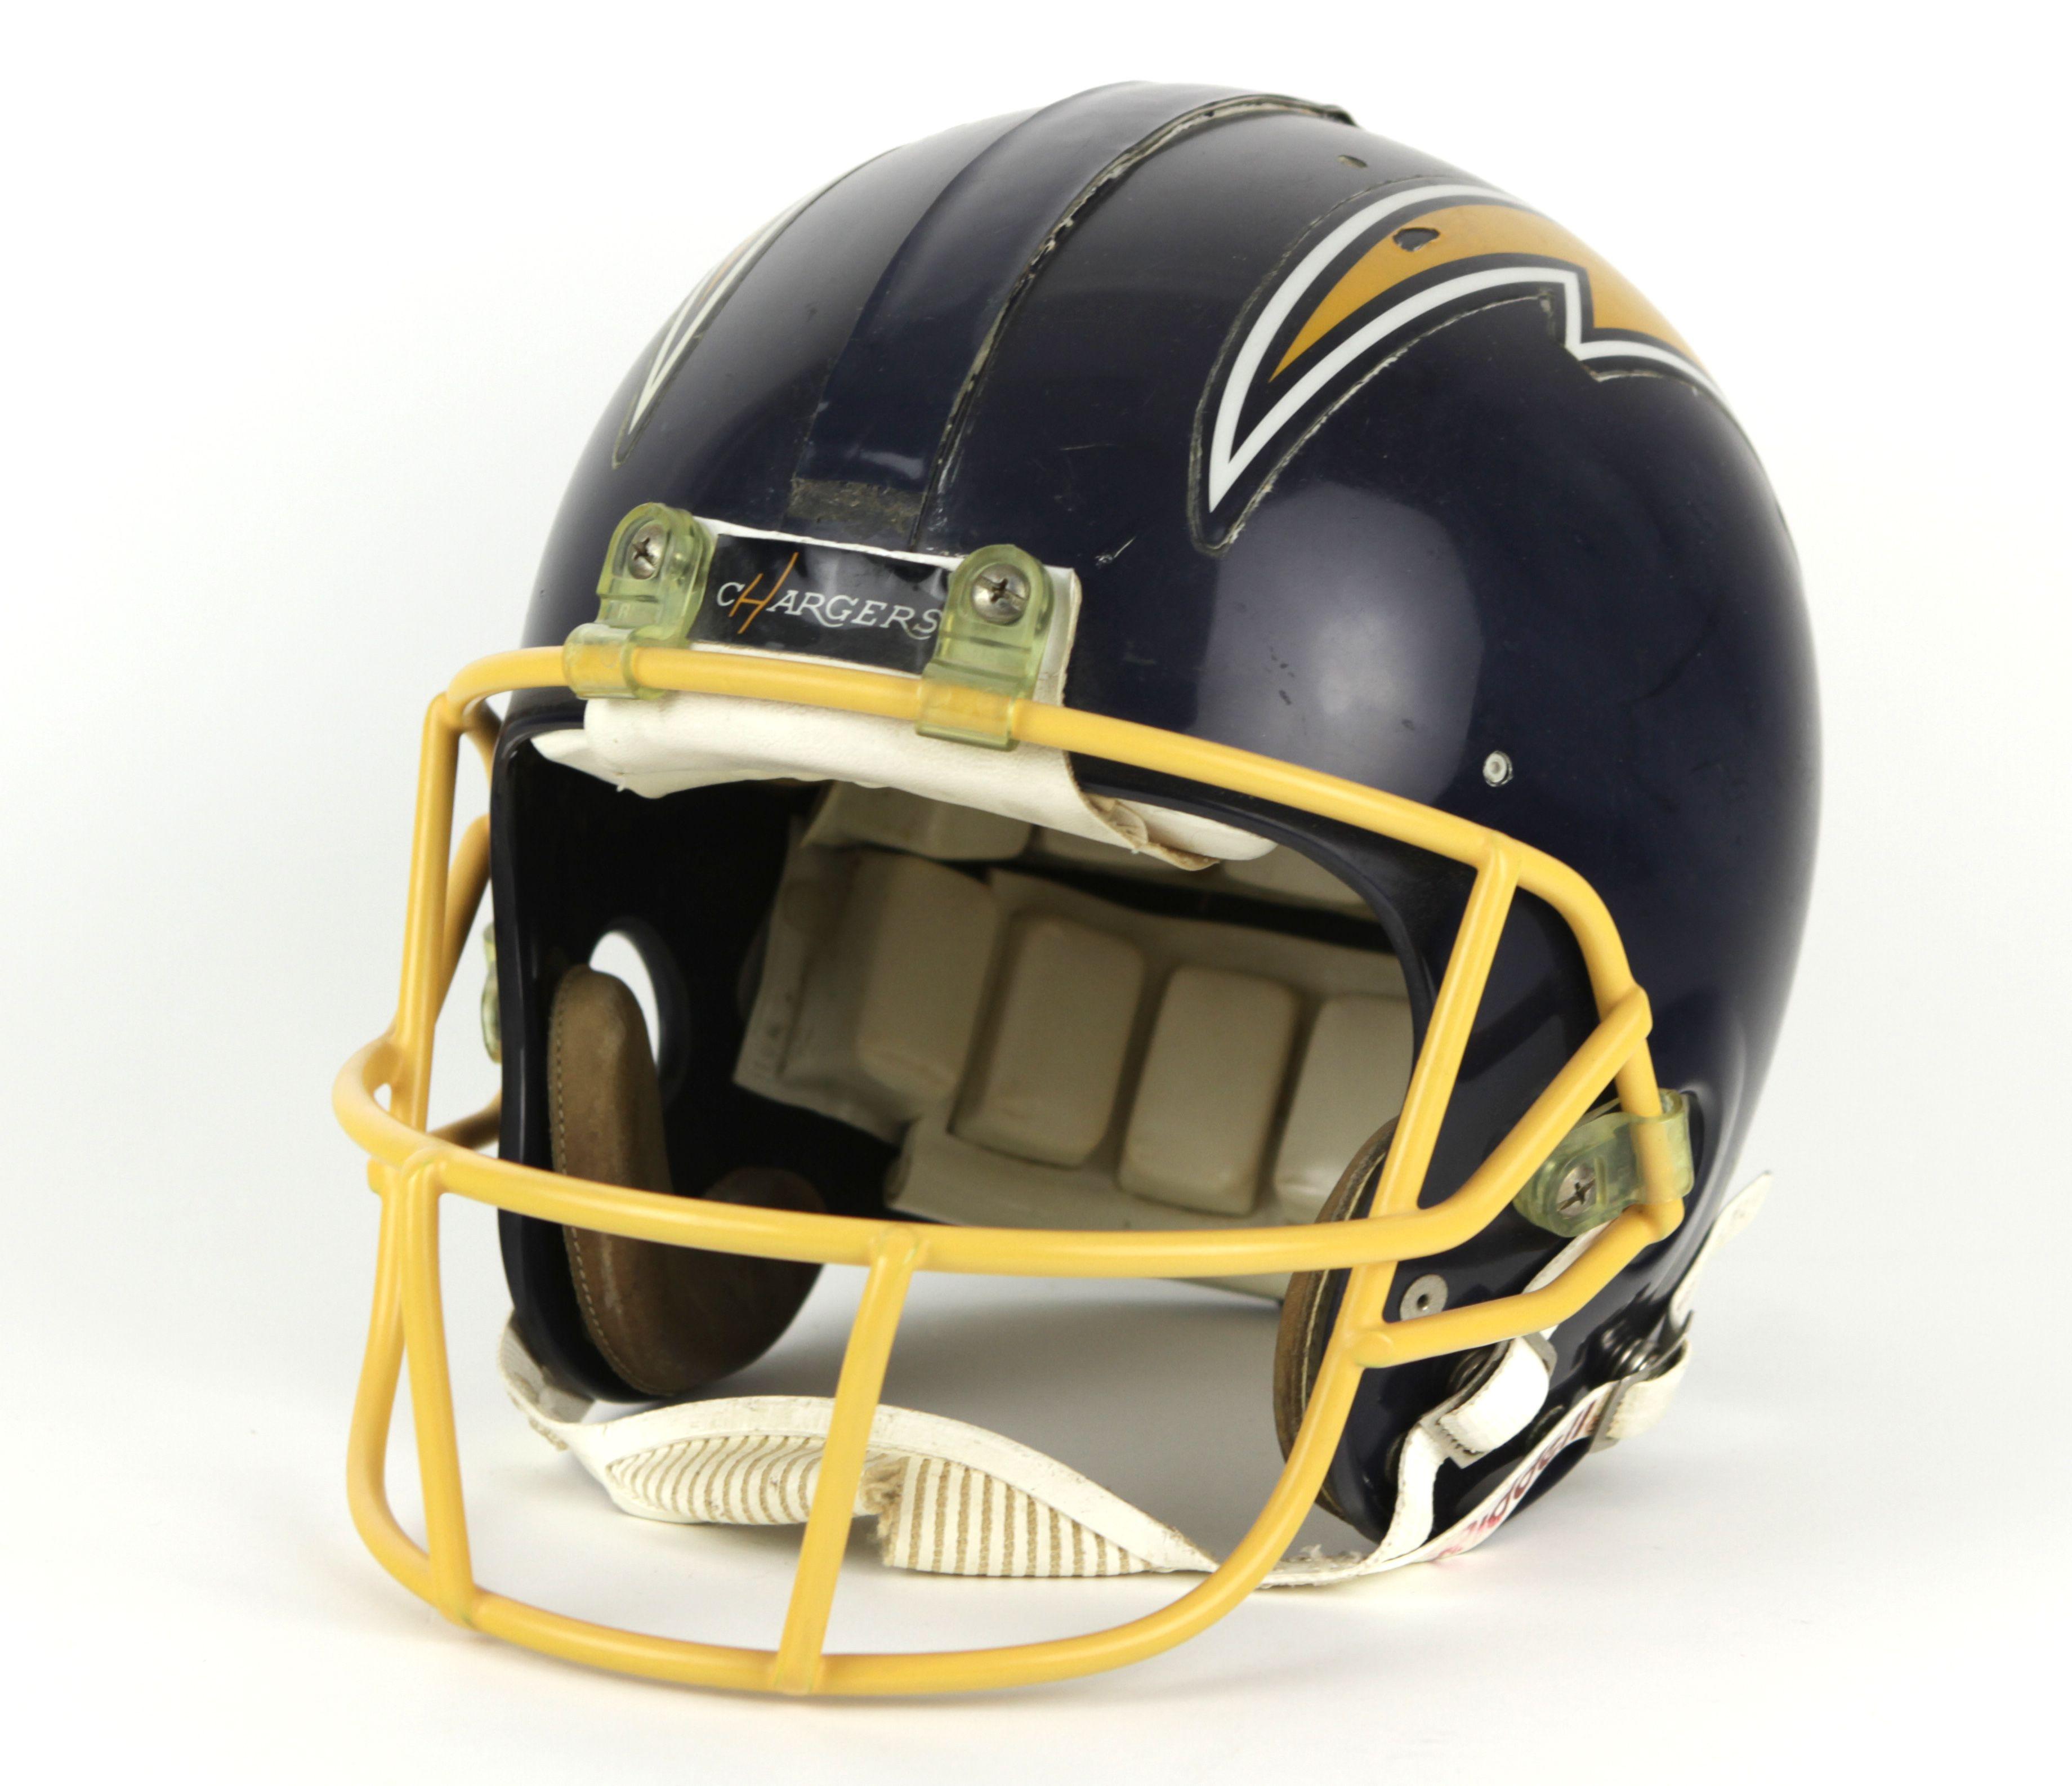 San Diego Chargers Helmet Decals: 1988-90 Gil Byrd San Diego Chargers Game Worn